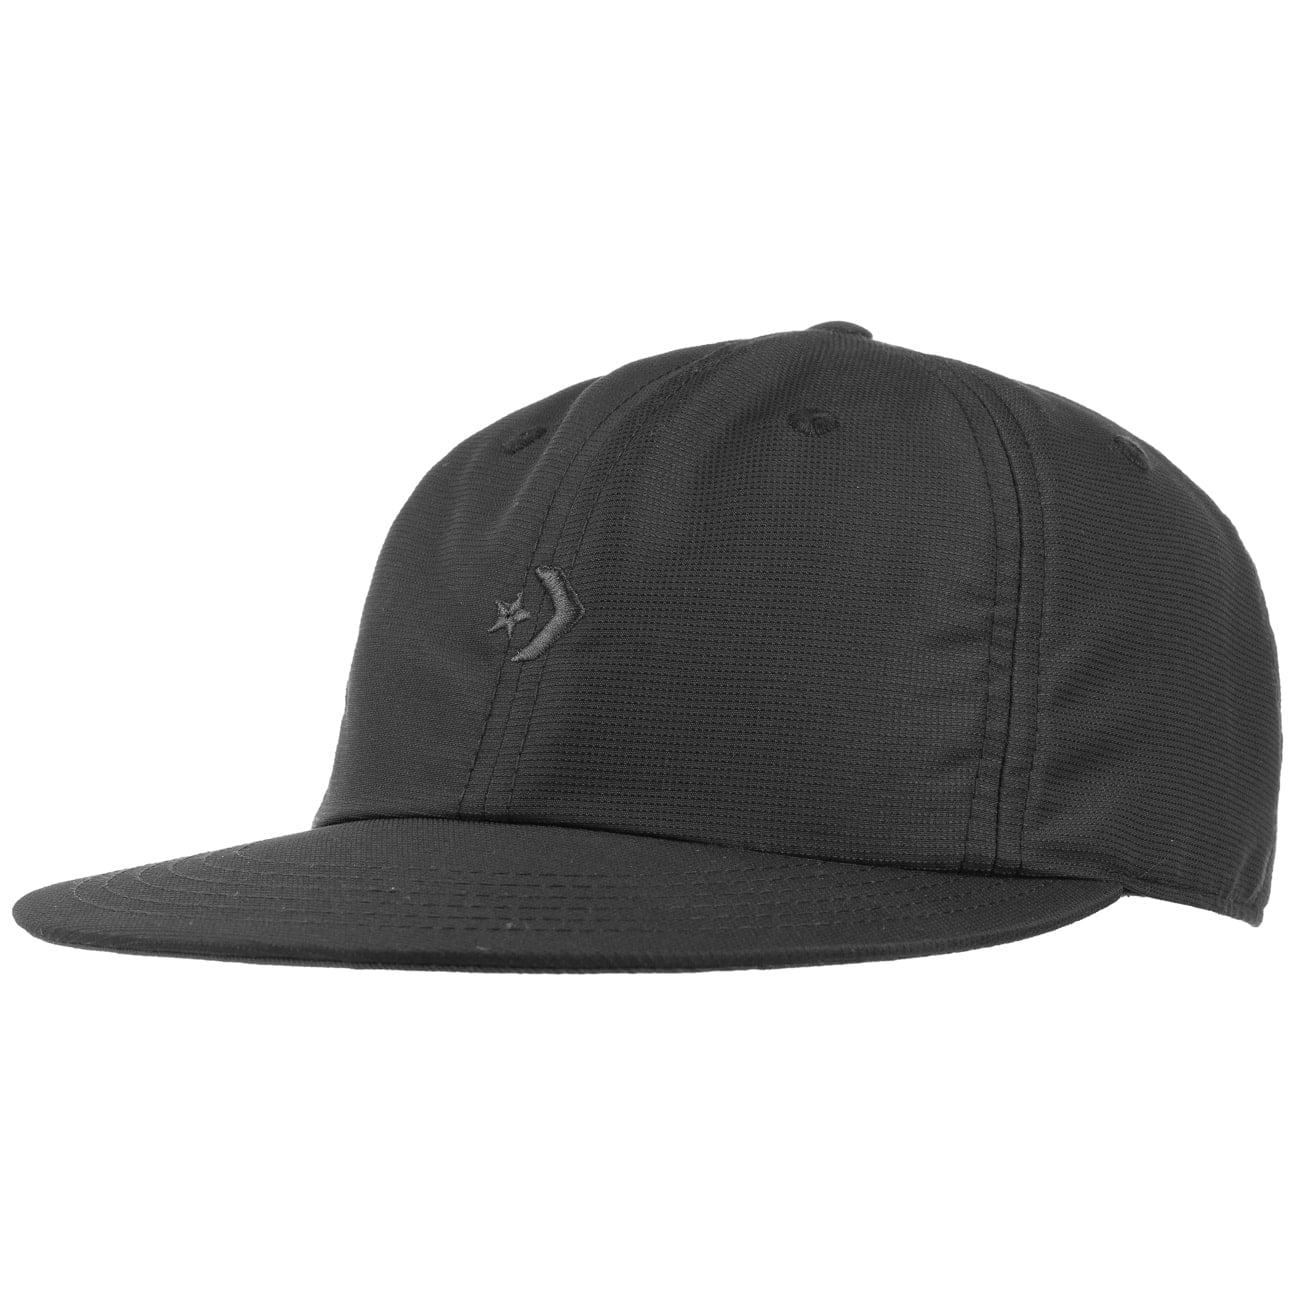 Casquette Star Tonal Flat Brim by Converse  baseball cap